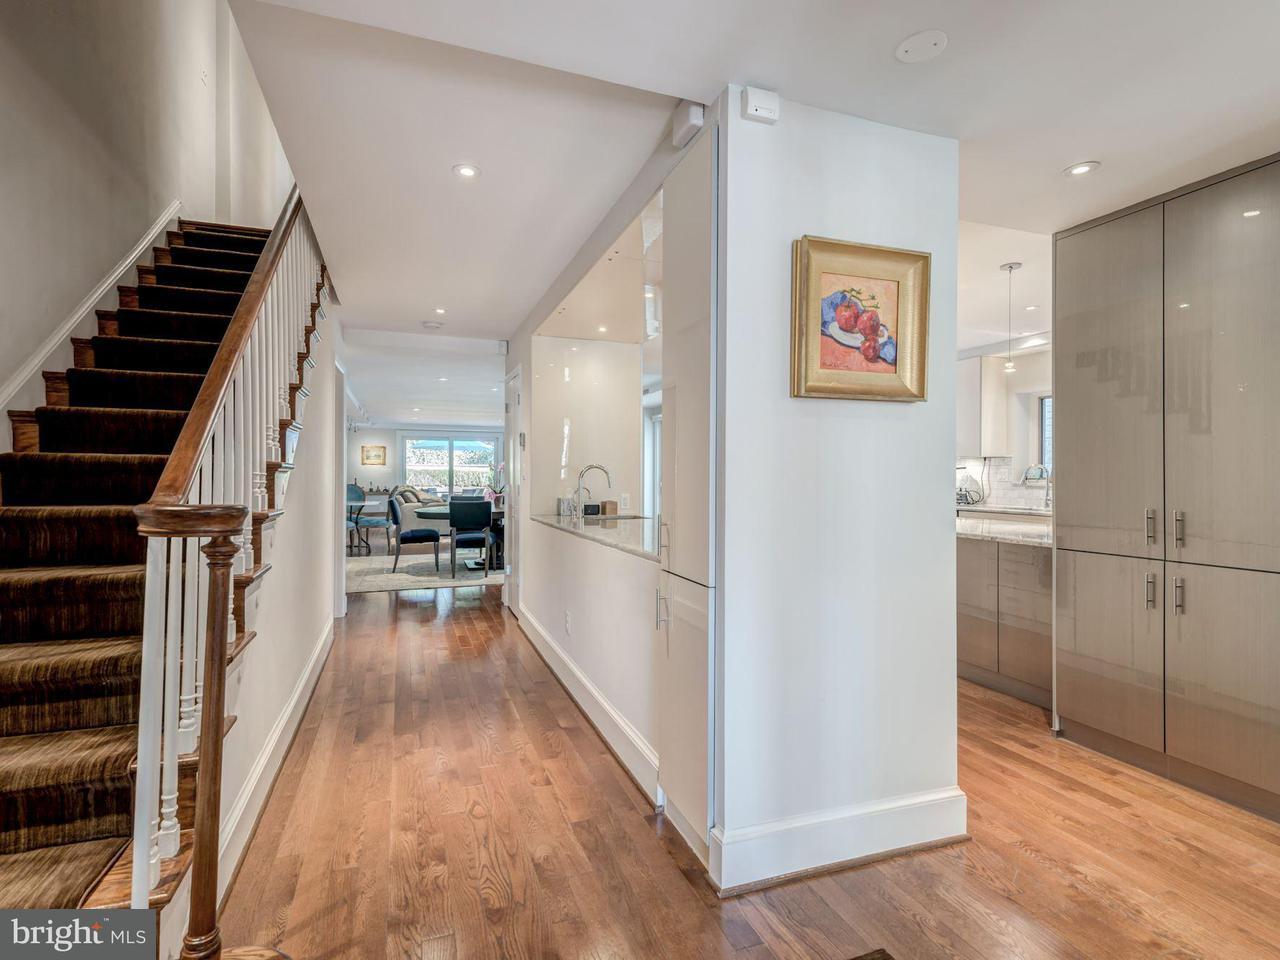 Additional photo for property listing at 2525 P St Nw 2525 P St Nw Washington, Distrito De Columbia 20007 Estados Unidos